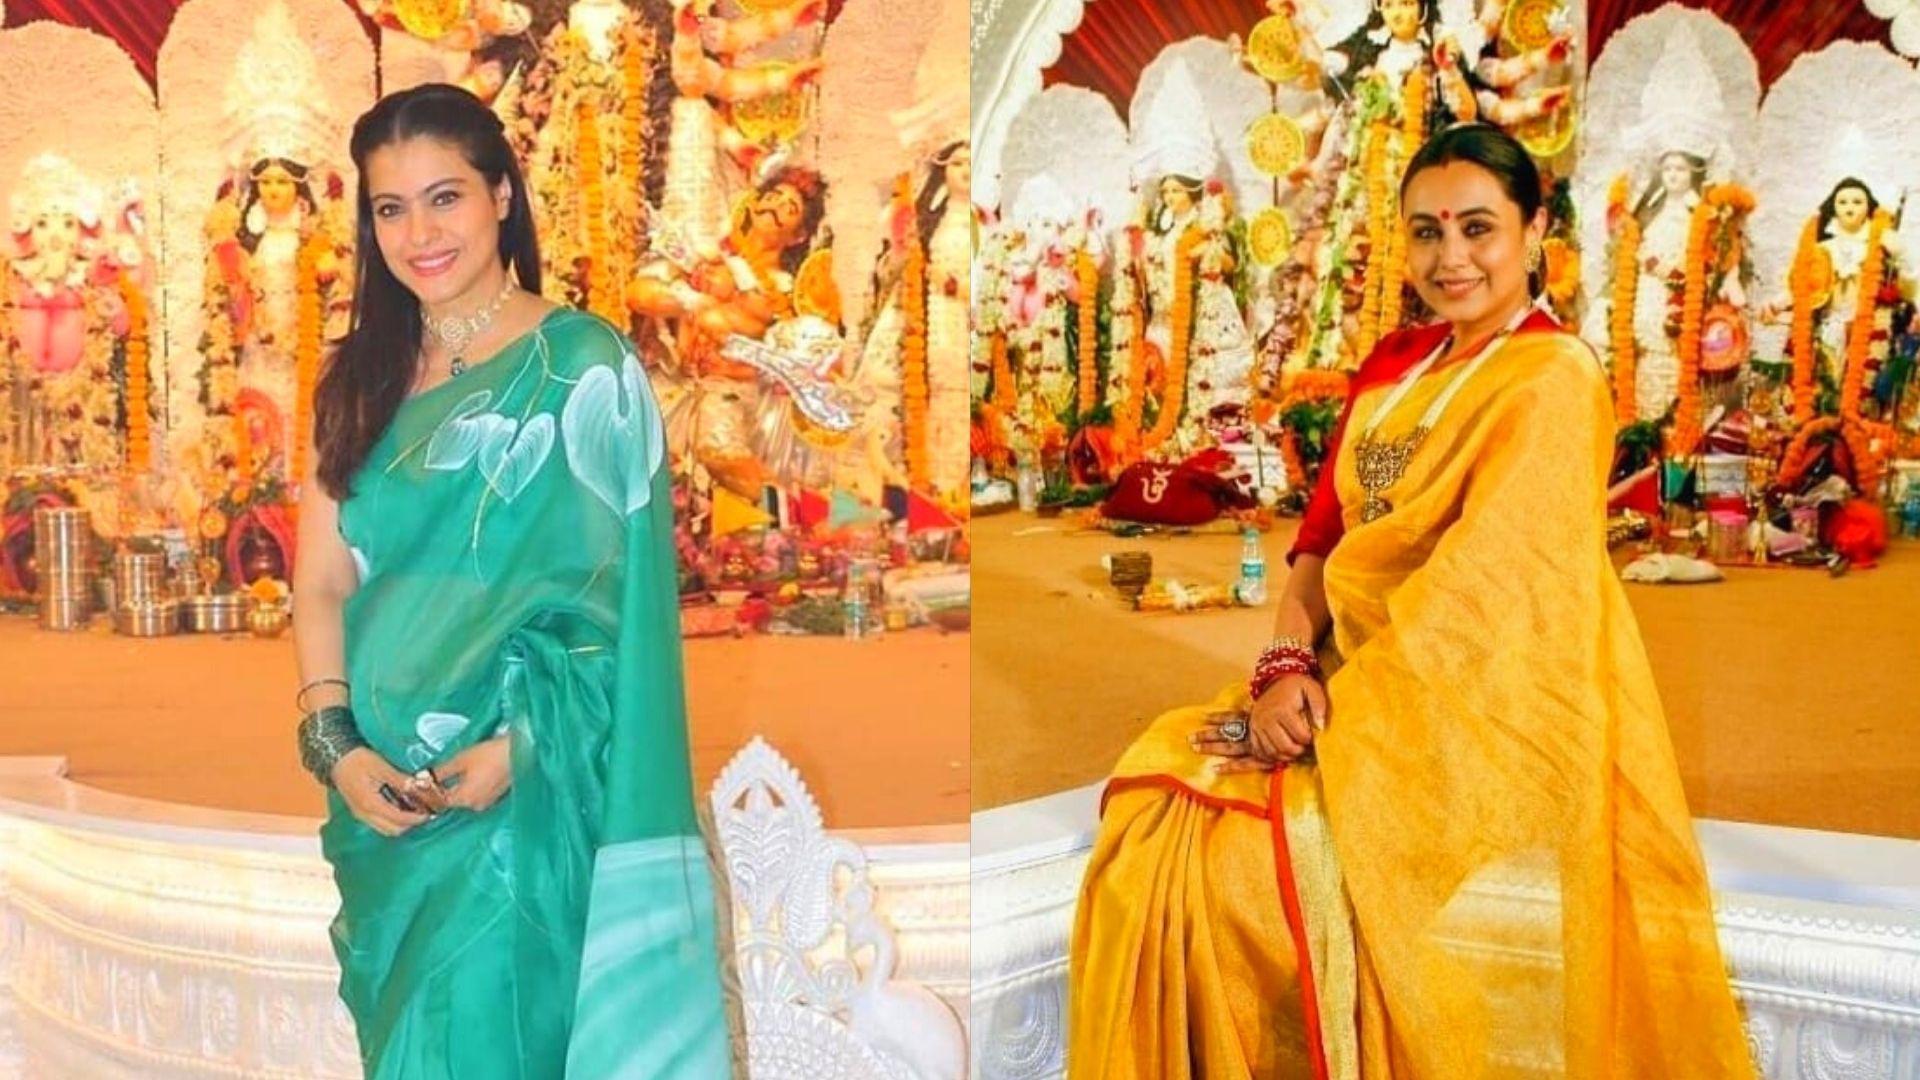 Ram Navami 2021: Cousins Rani Mukerji And Kajol Look Extremely Graceful As They Deck Up For Maha Navami